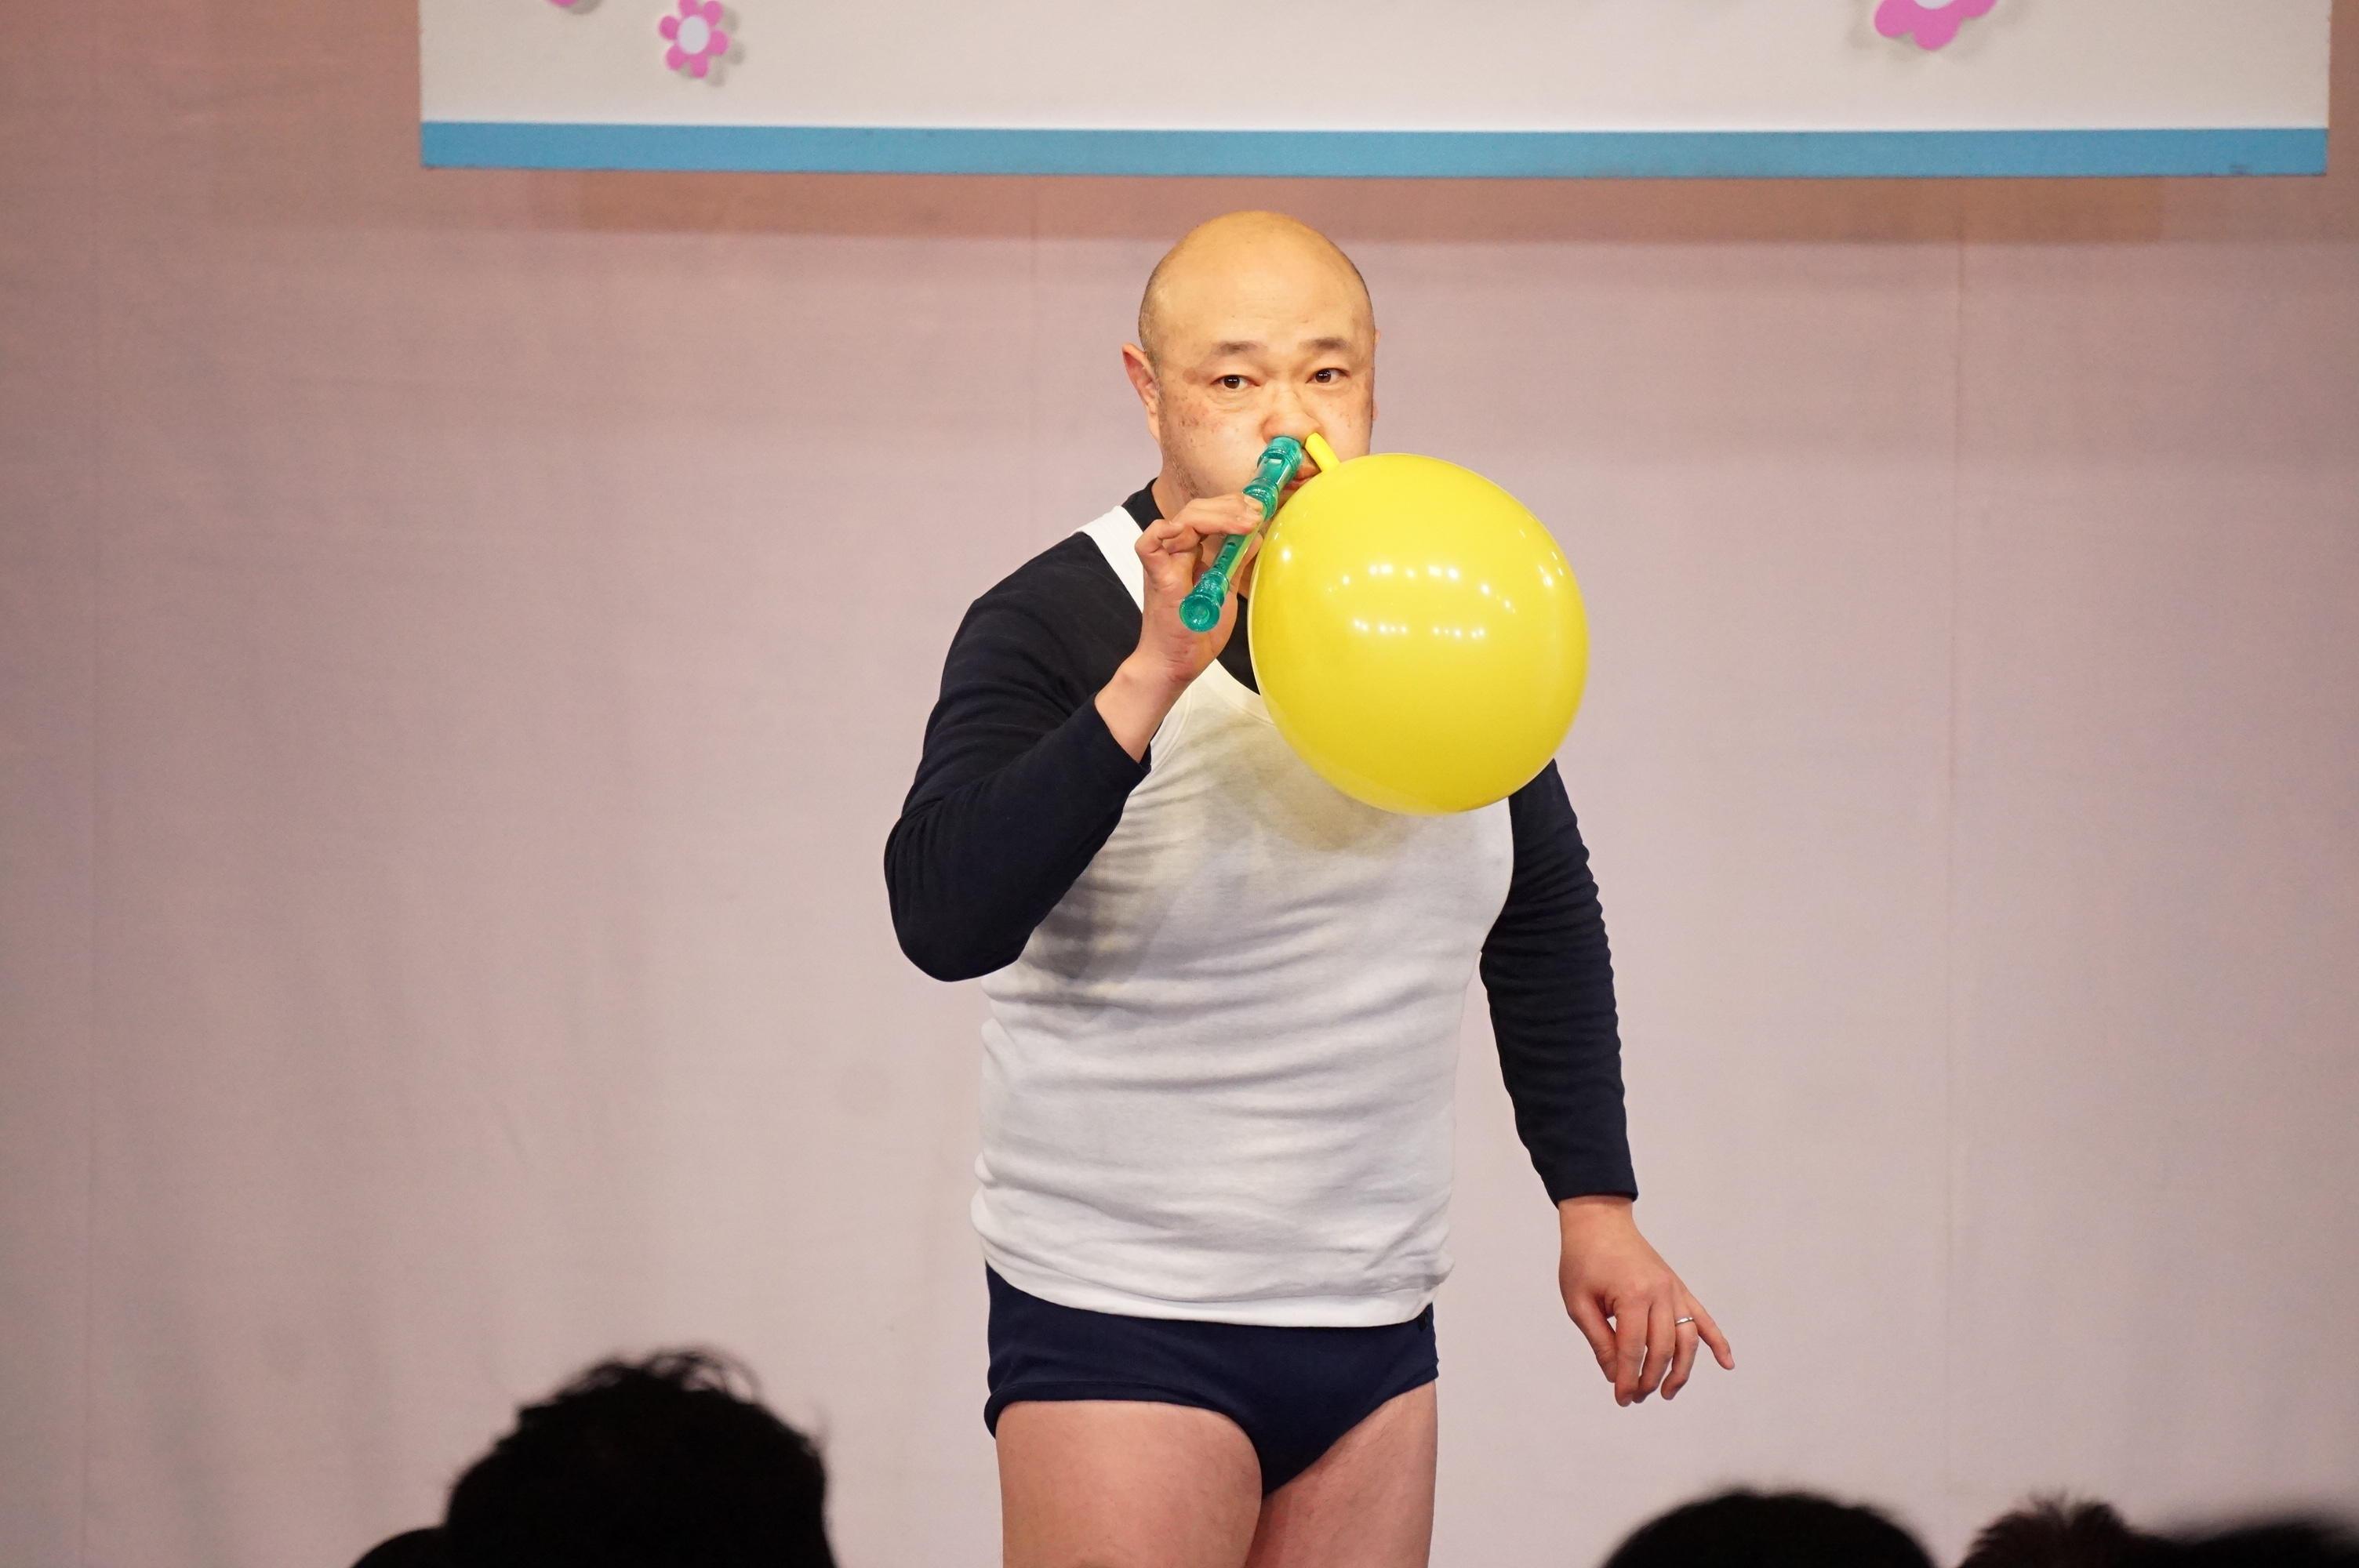 http://news.yoshimoto.co.jp/20170314201417-67bc299f7e97d1739c3a5421302ab246d6667258.jpg